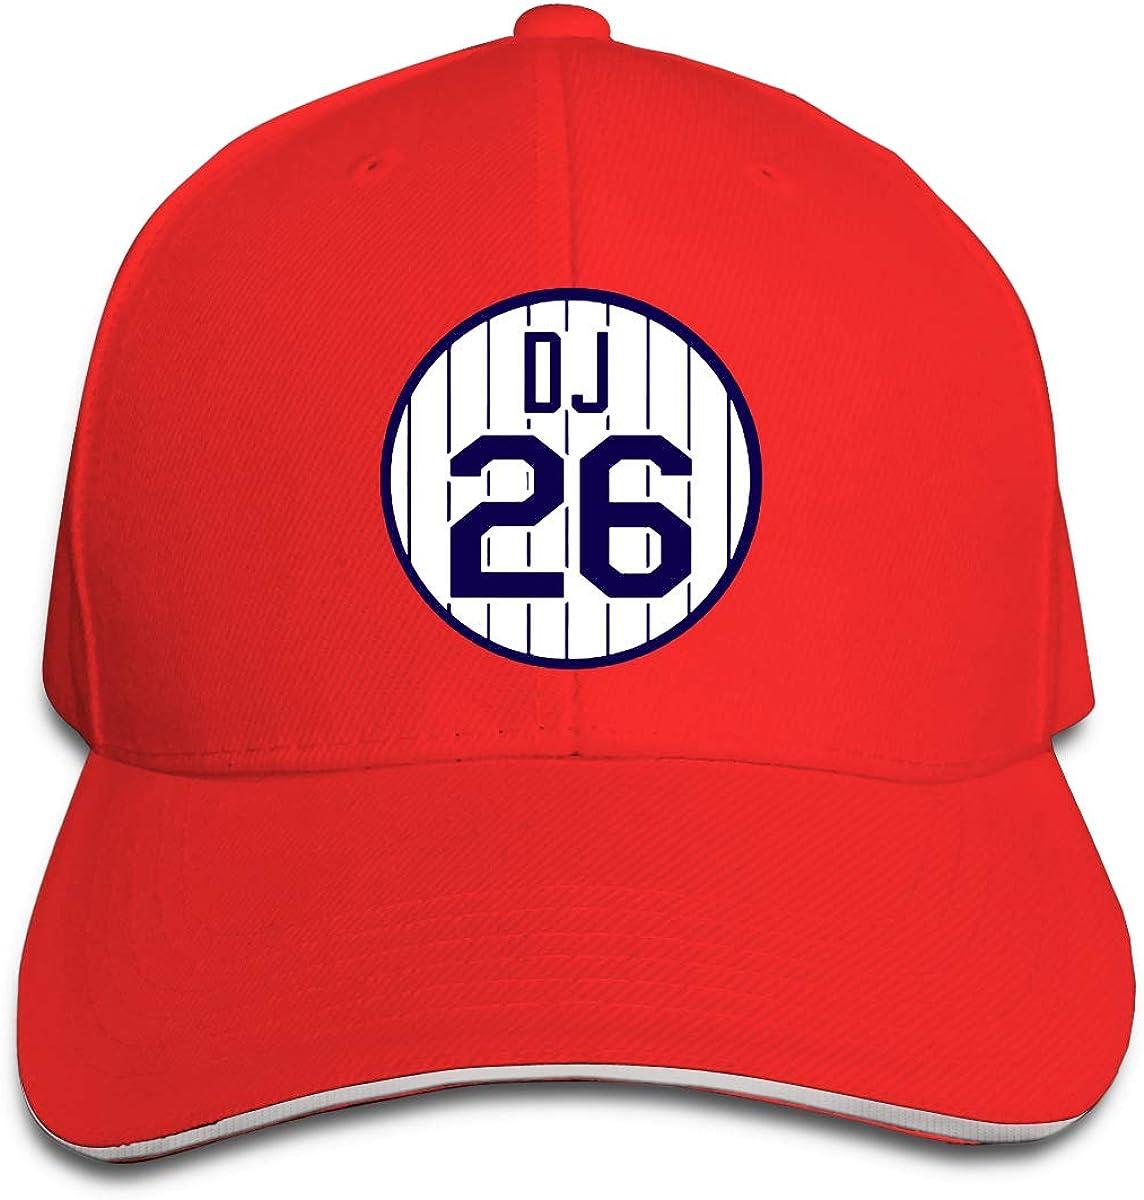 Adjustable Baseball Cap...